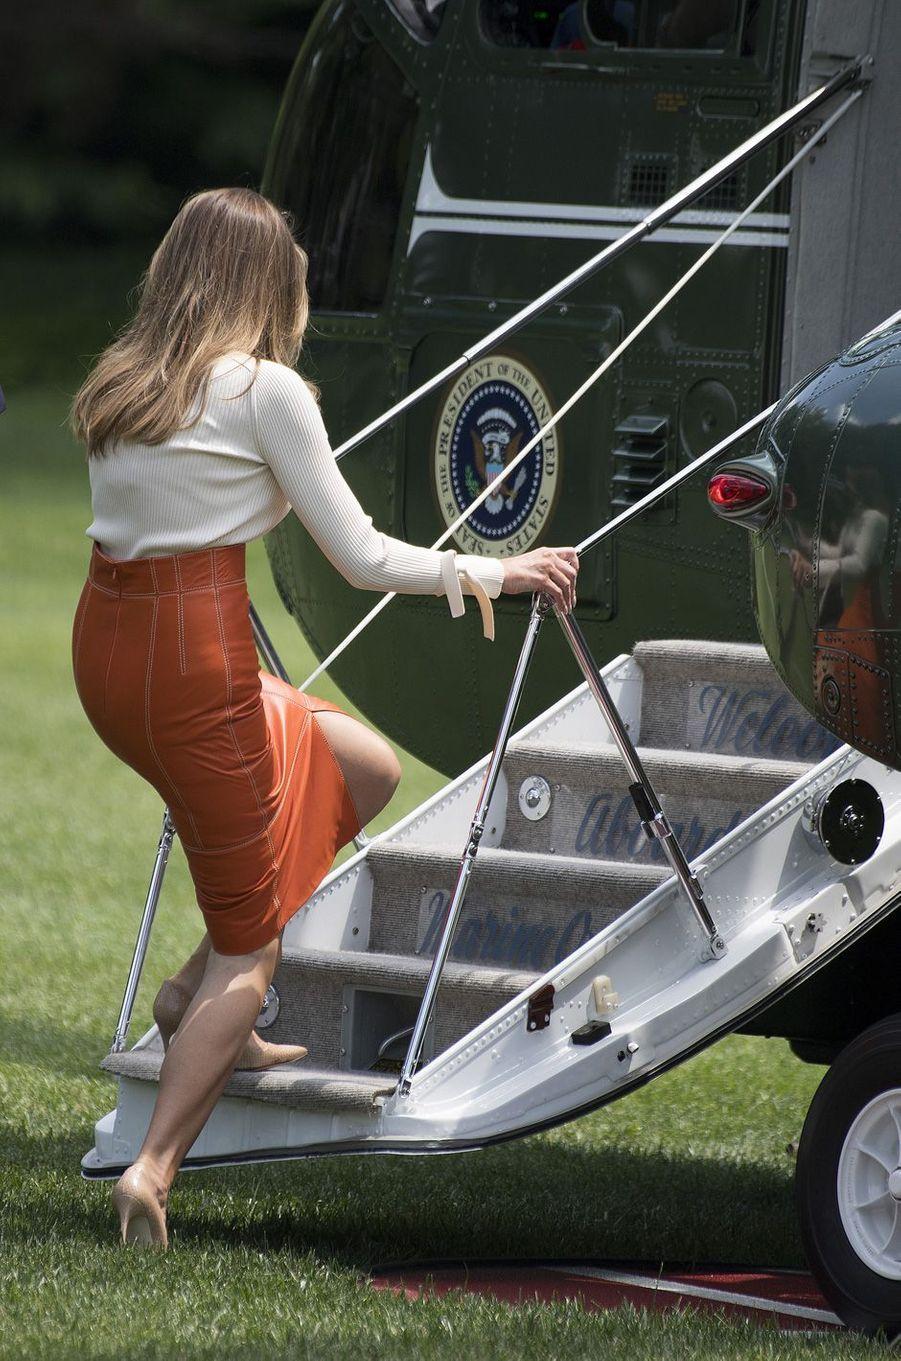 Melania Trump quittant la Maison Blanche, le 19 mai 2017.